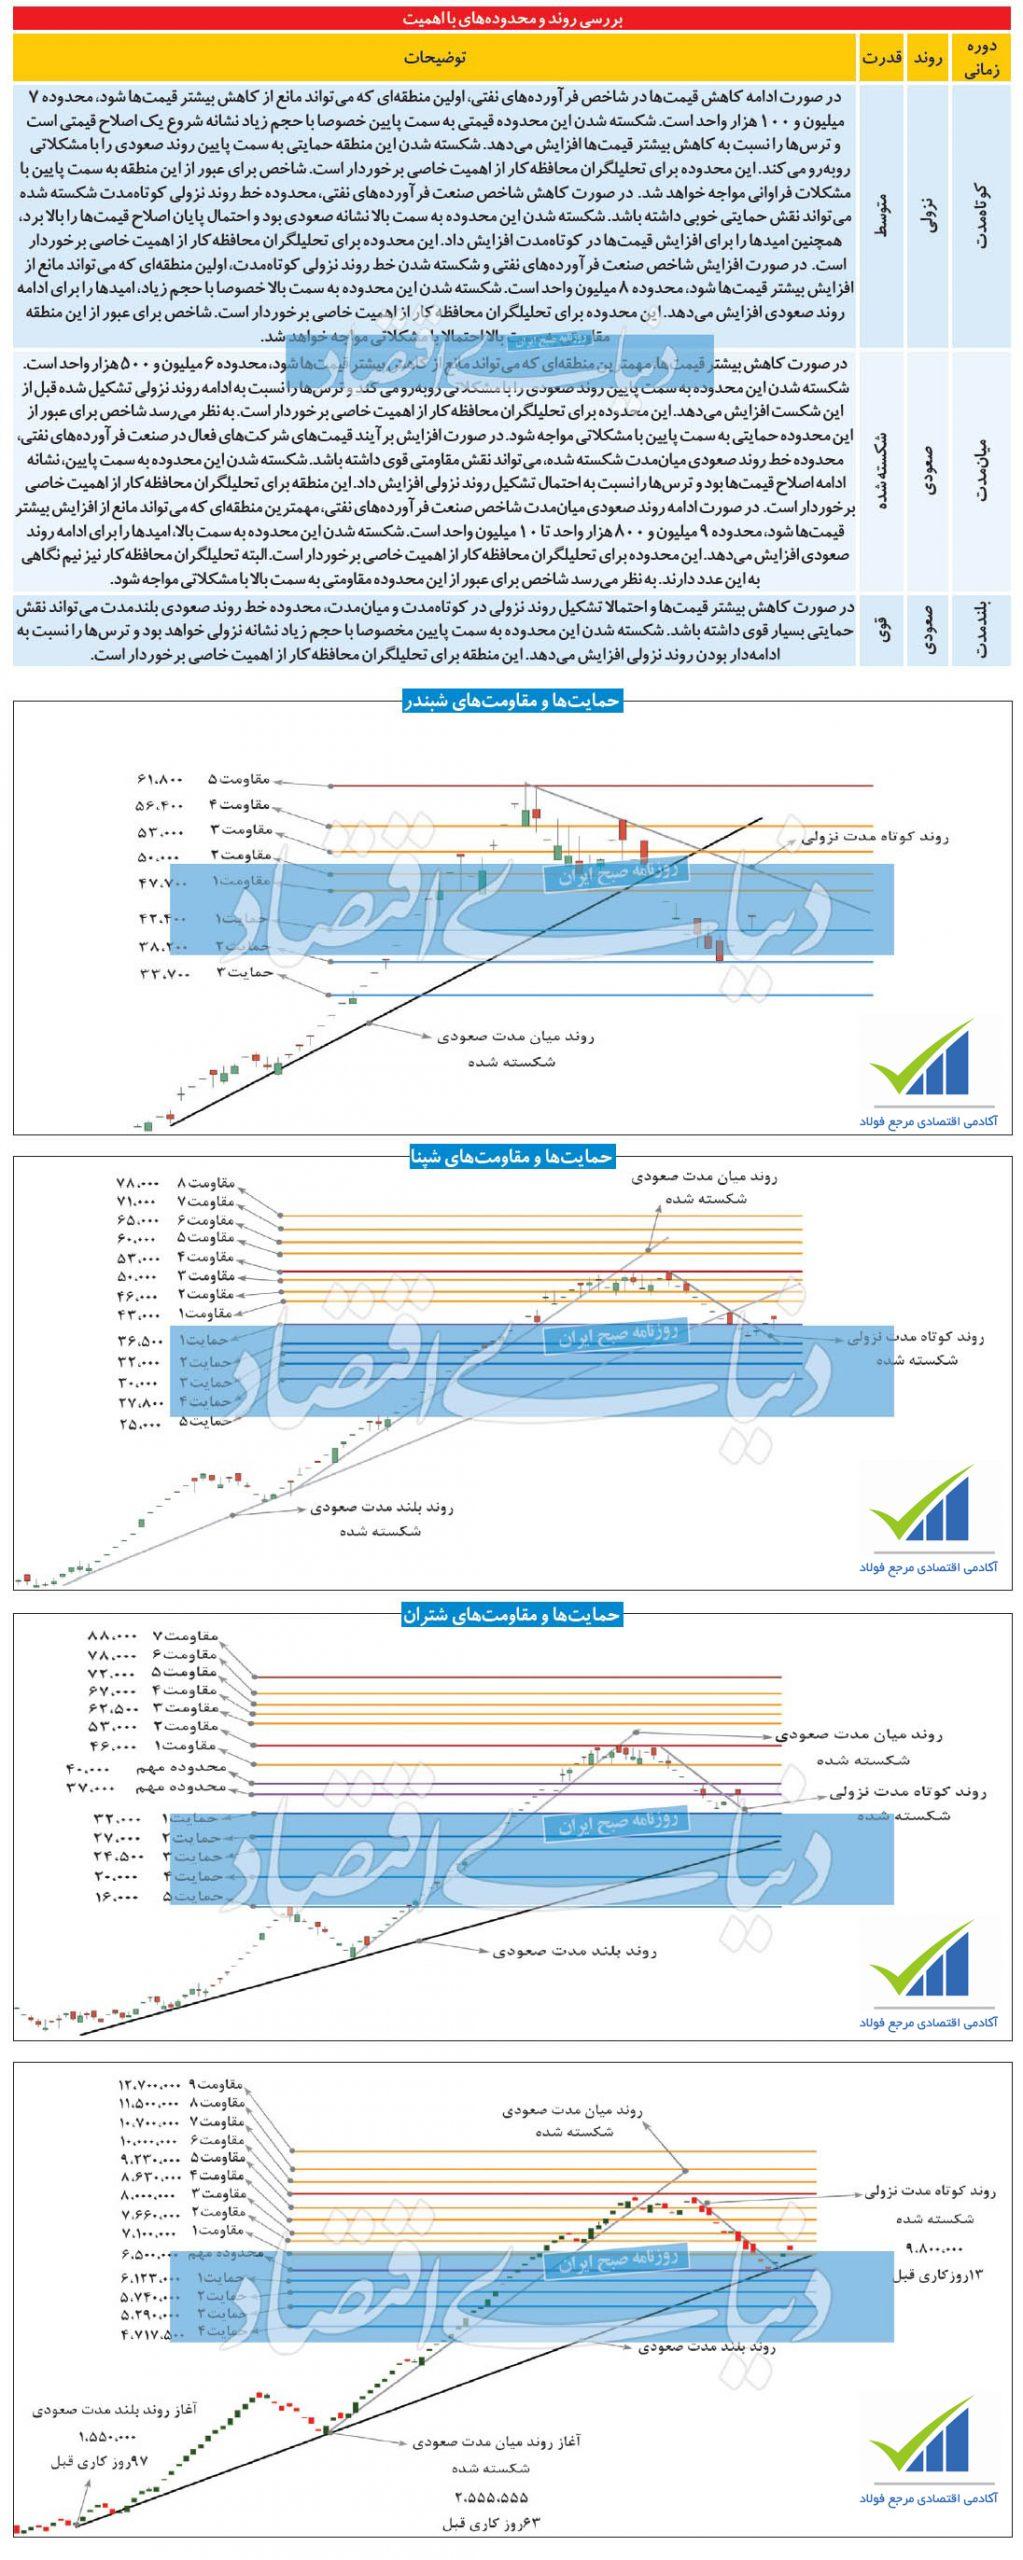 شبندر scaled - احتمال صعود نماد شپنا و شبندر + نمودار